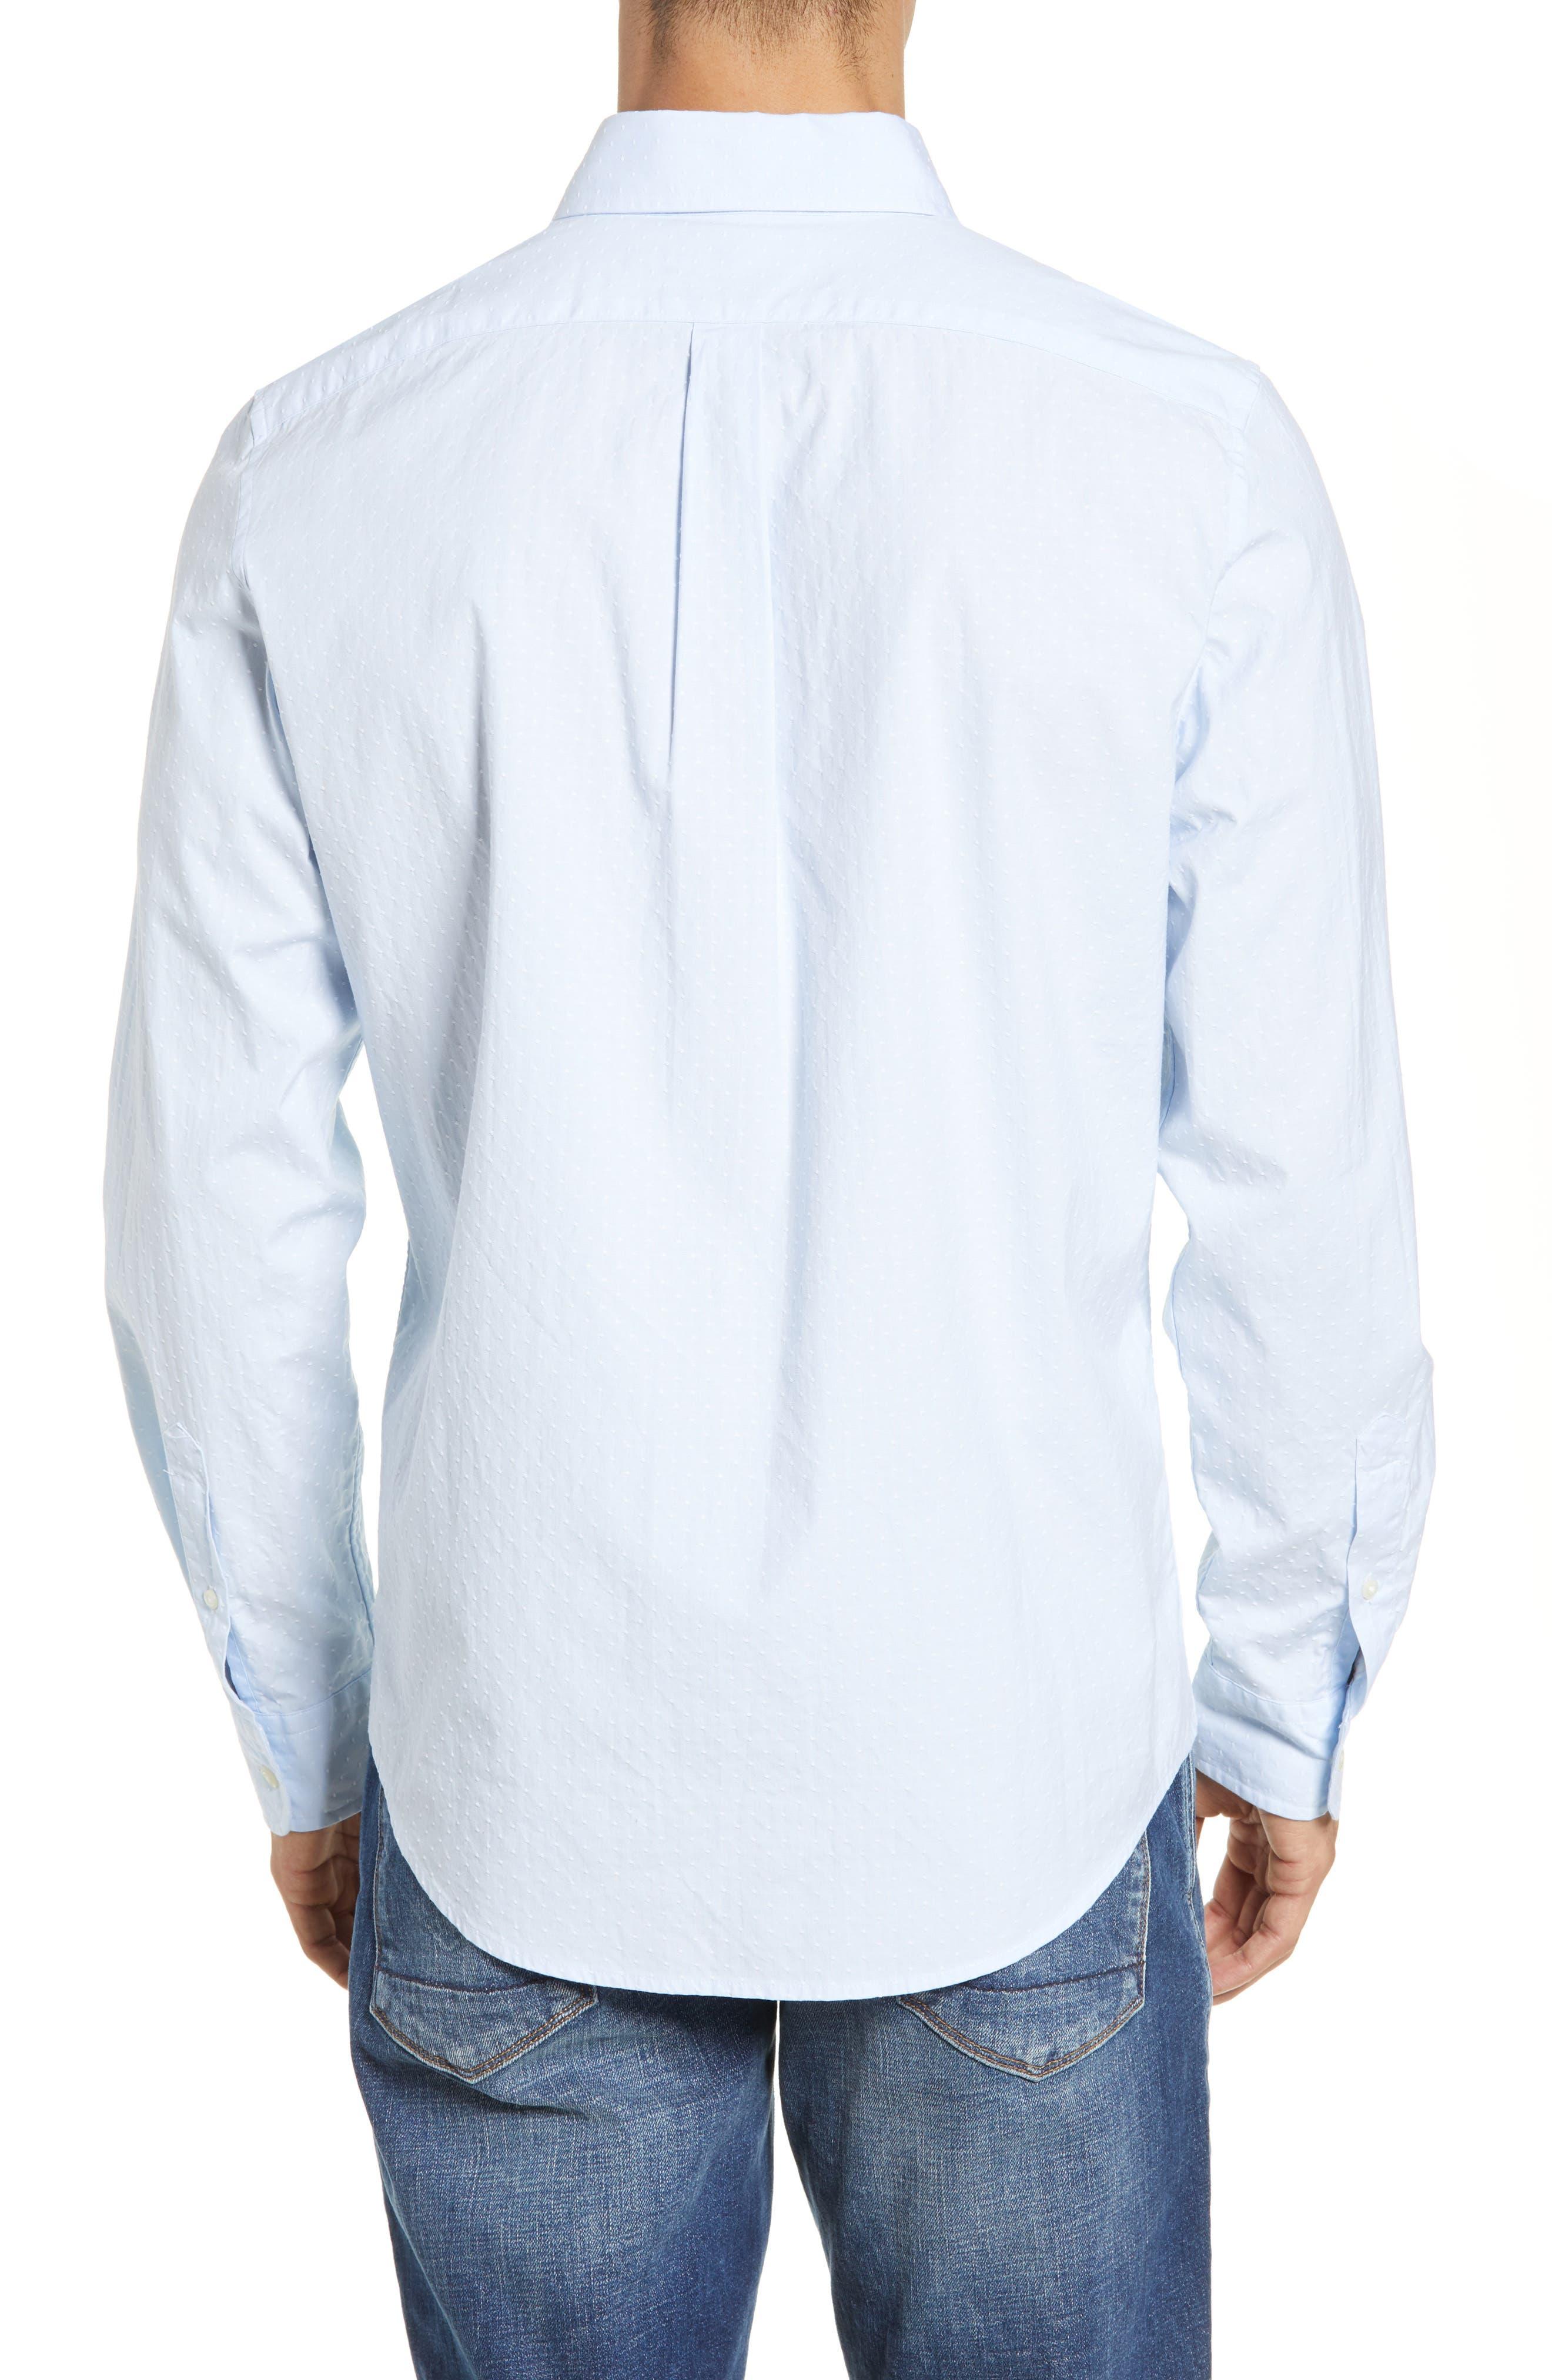 VINEYARD VINES, Wavine Slim Fit Dobby Sport Shirt, Alternate thumbnail 3, color, JAKE BLUE